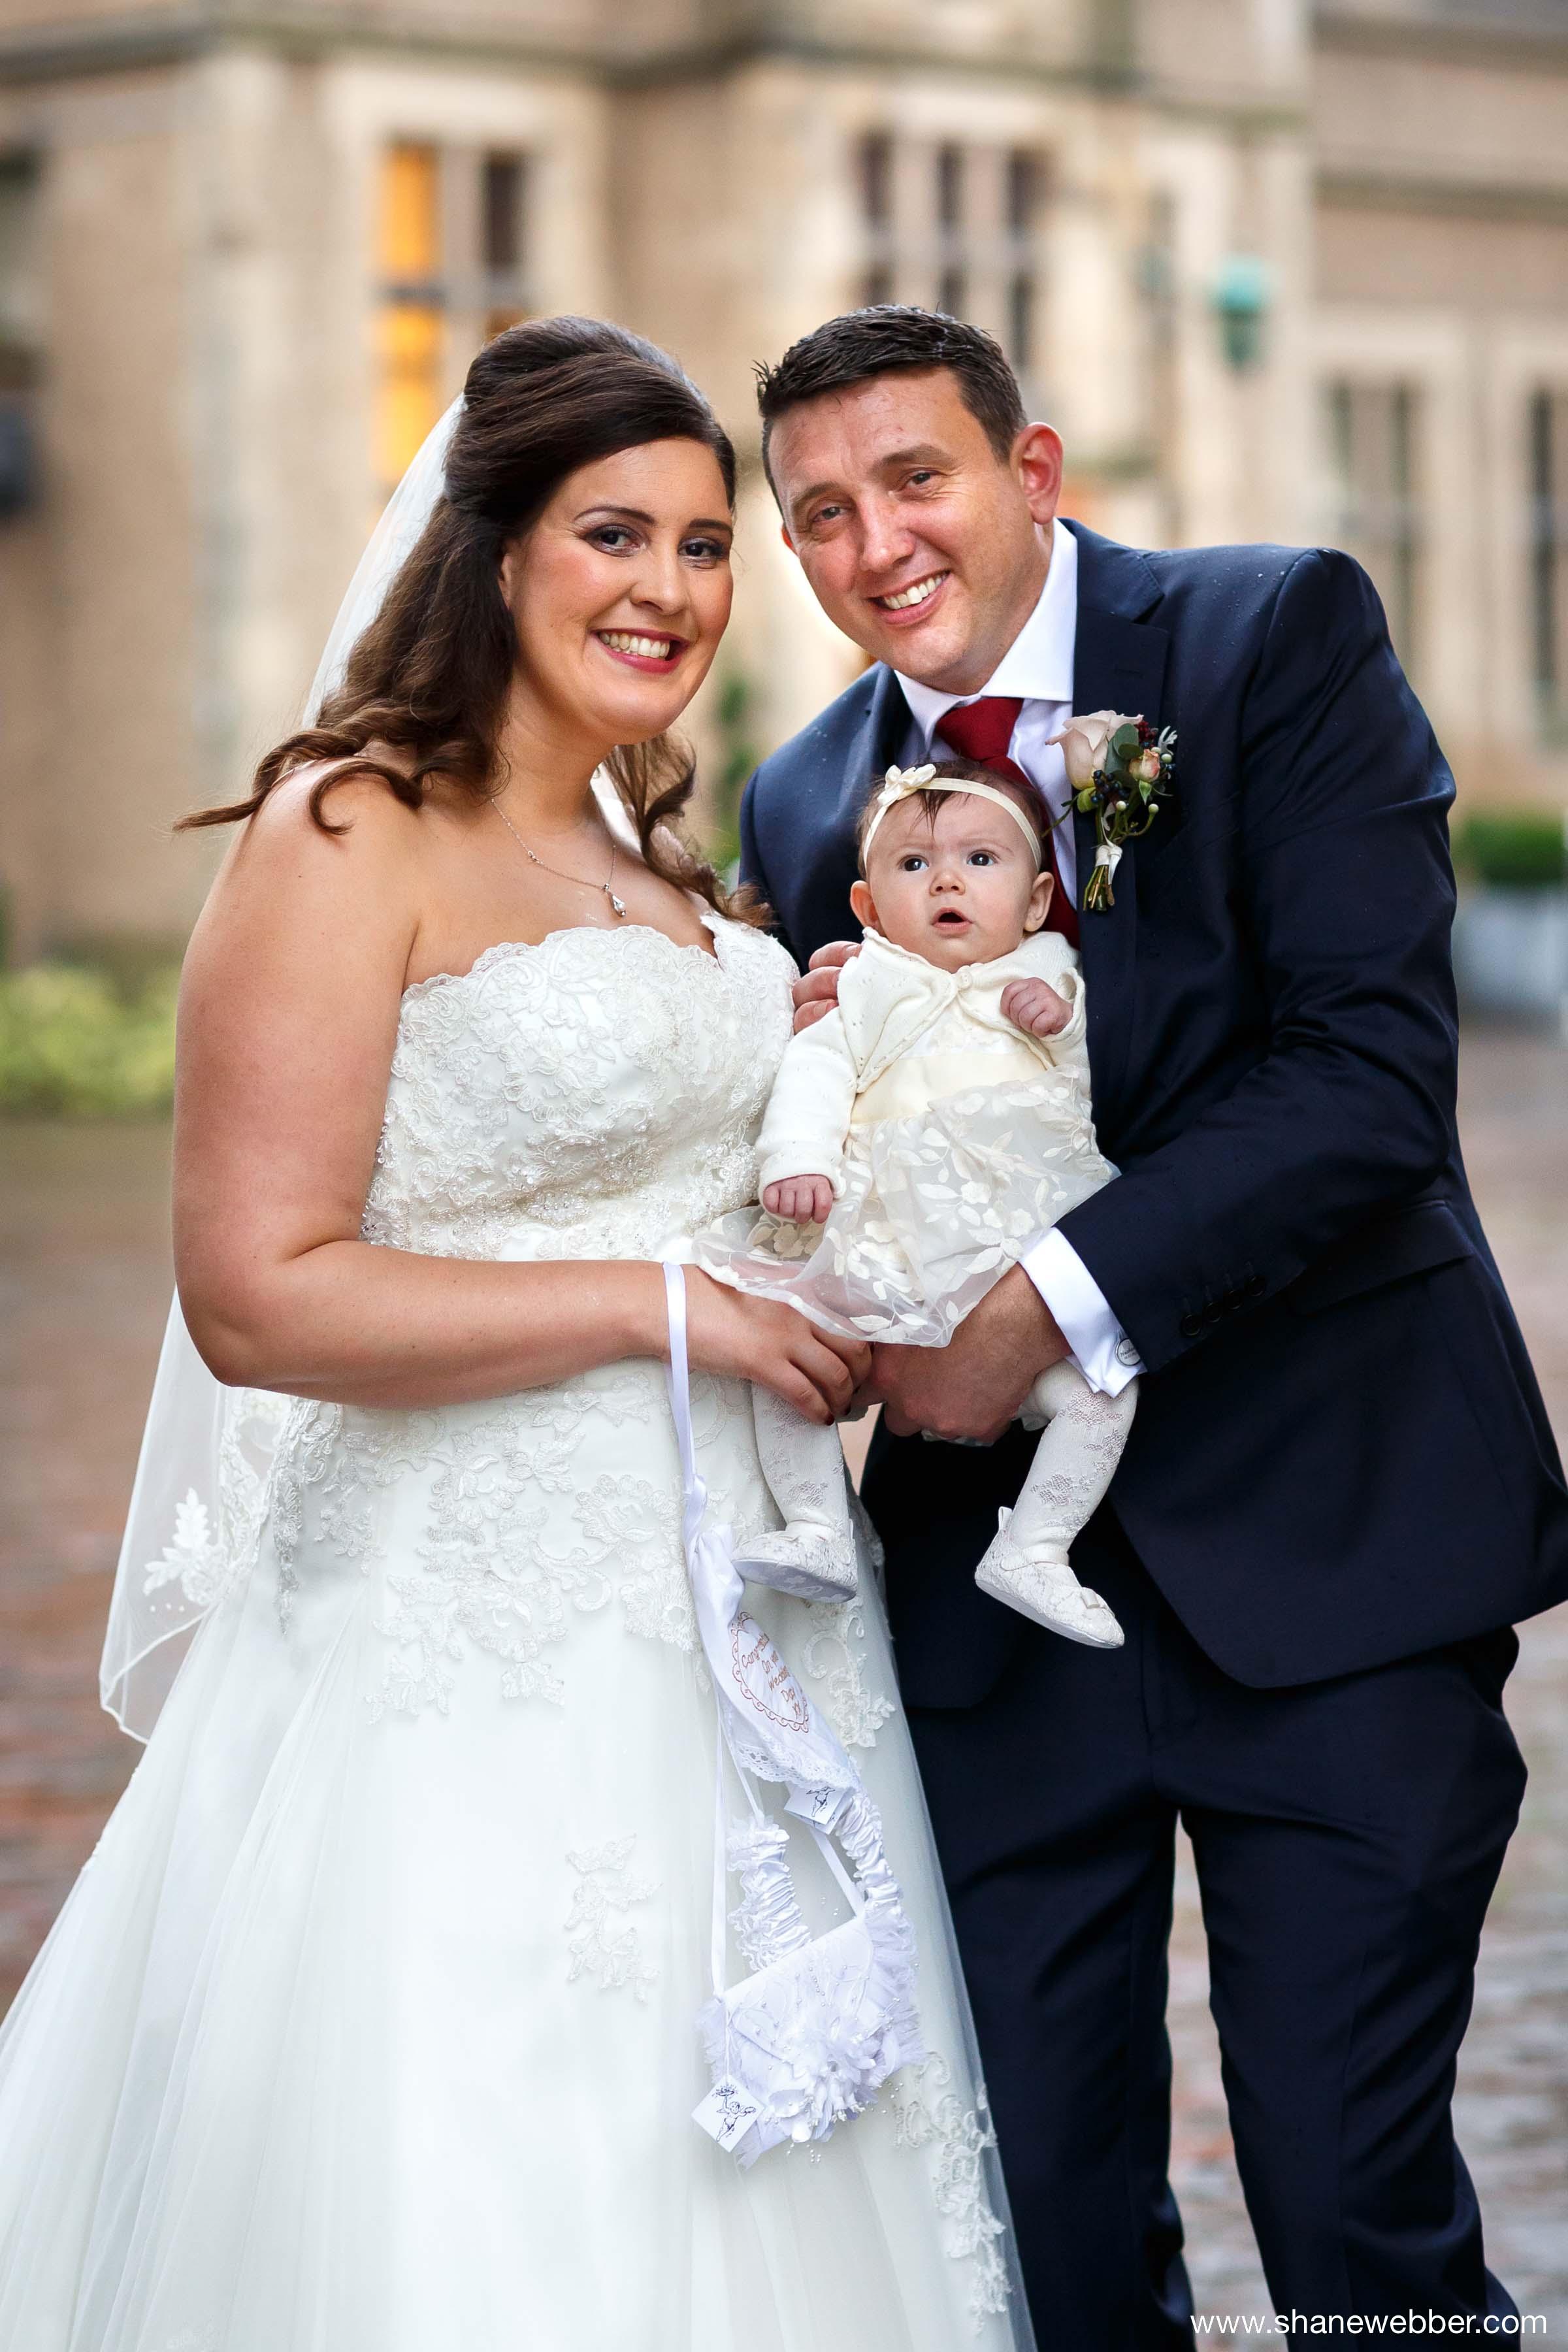 Family wedding photography